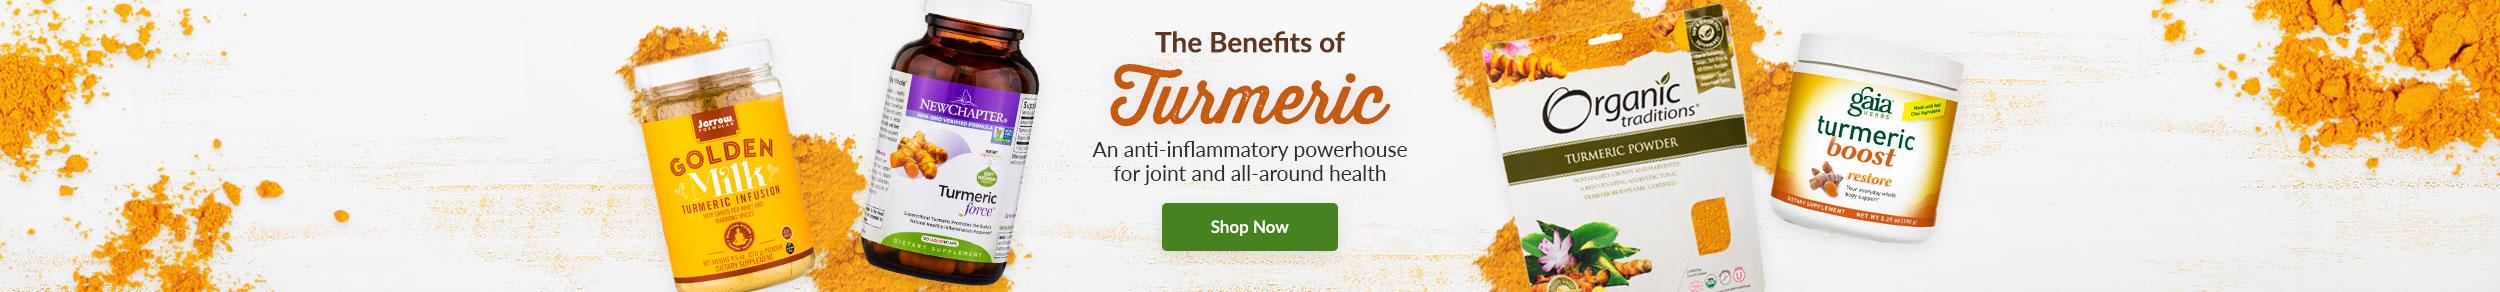 https://i3.pureformulas.net/images/static/Generic-benefits-Turmeric_Beauty-3_091918.jpg